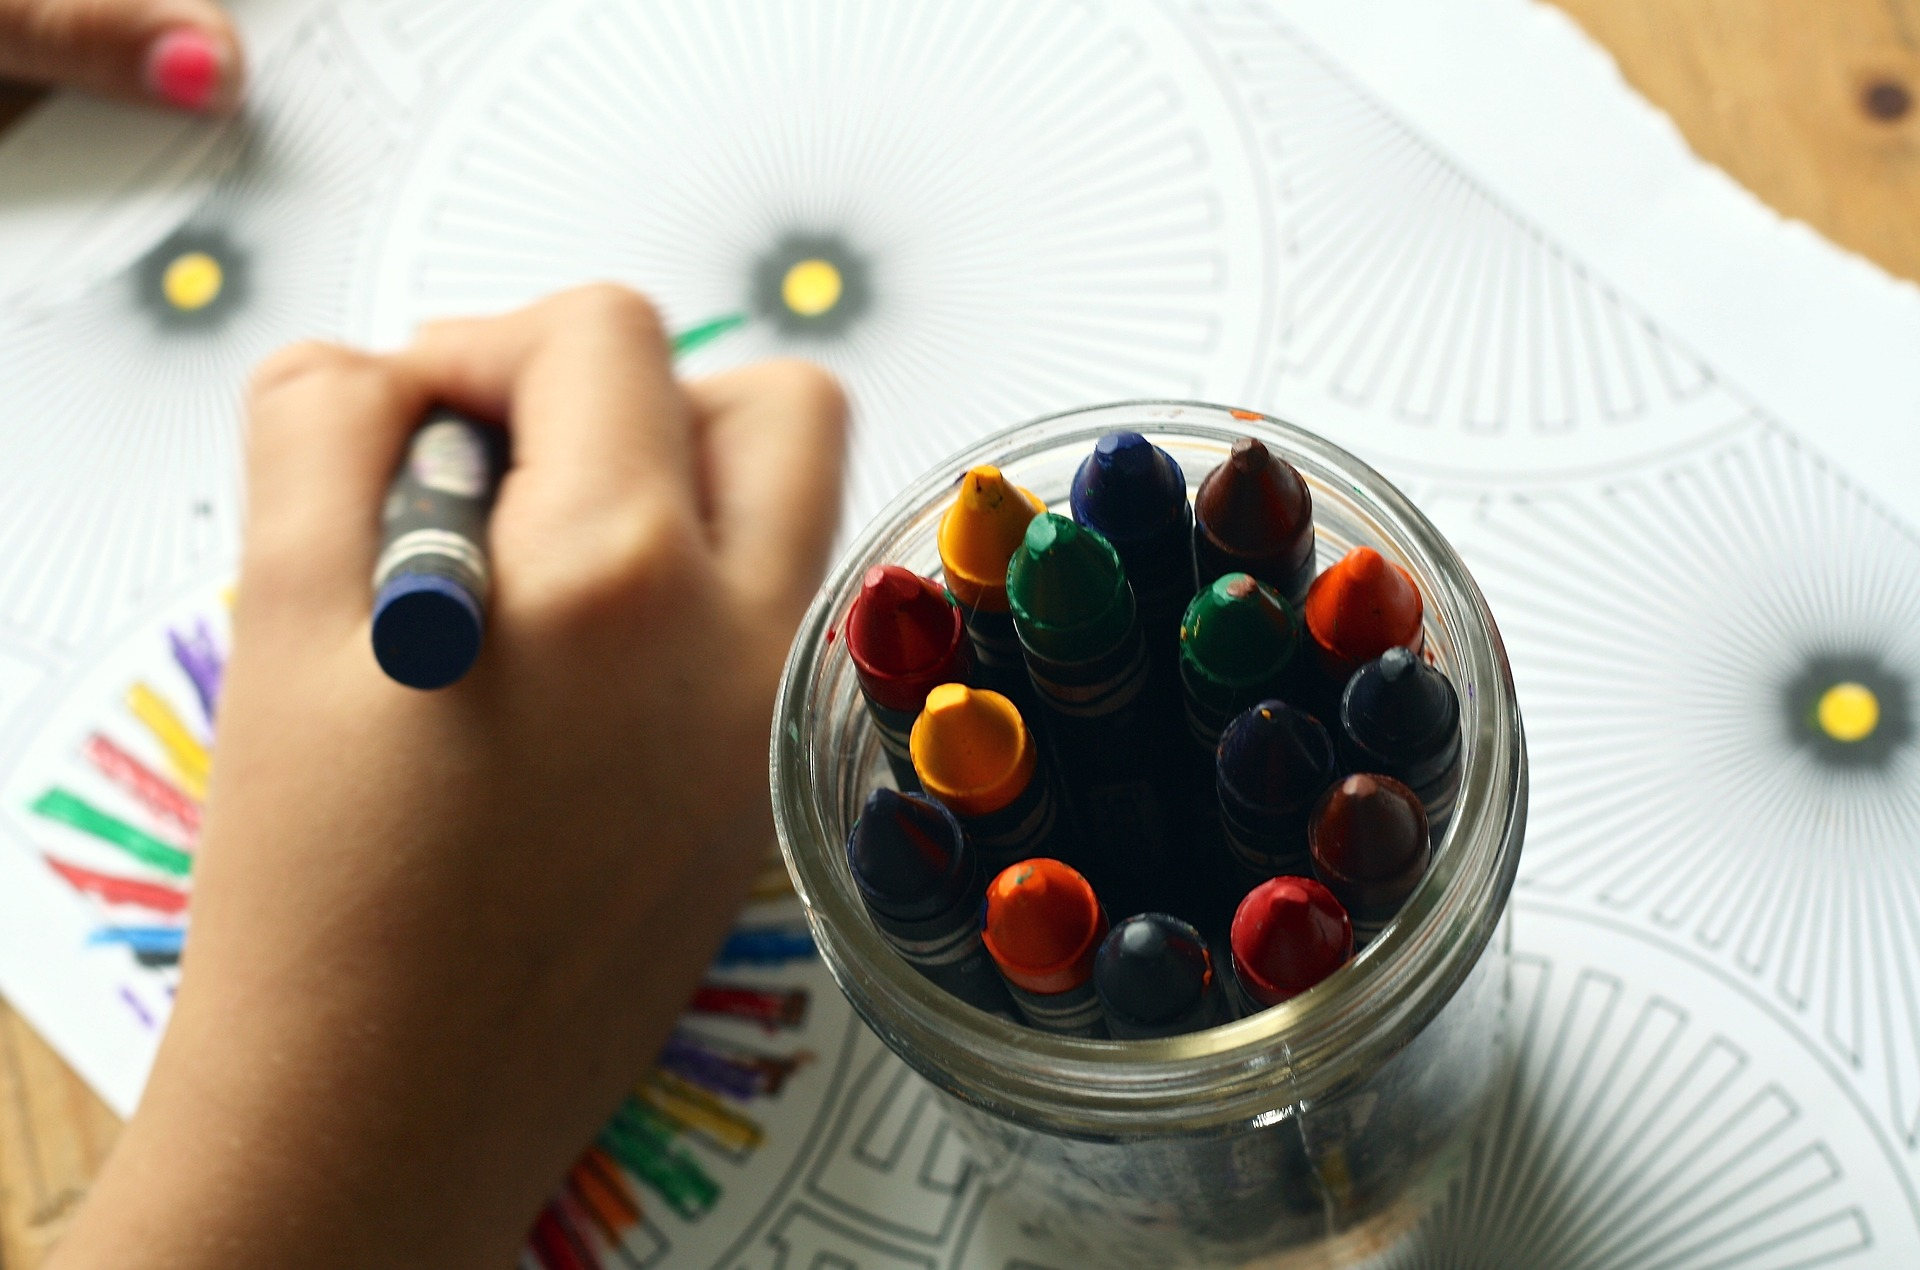 Mateřská školka jako povinný start do života